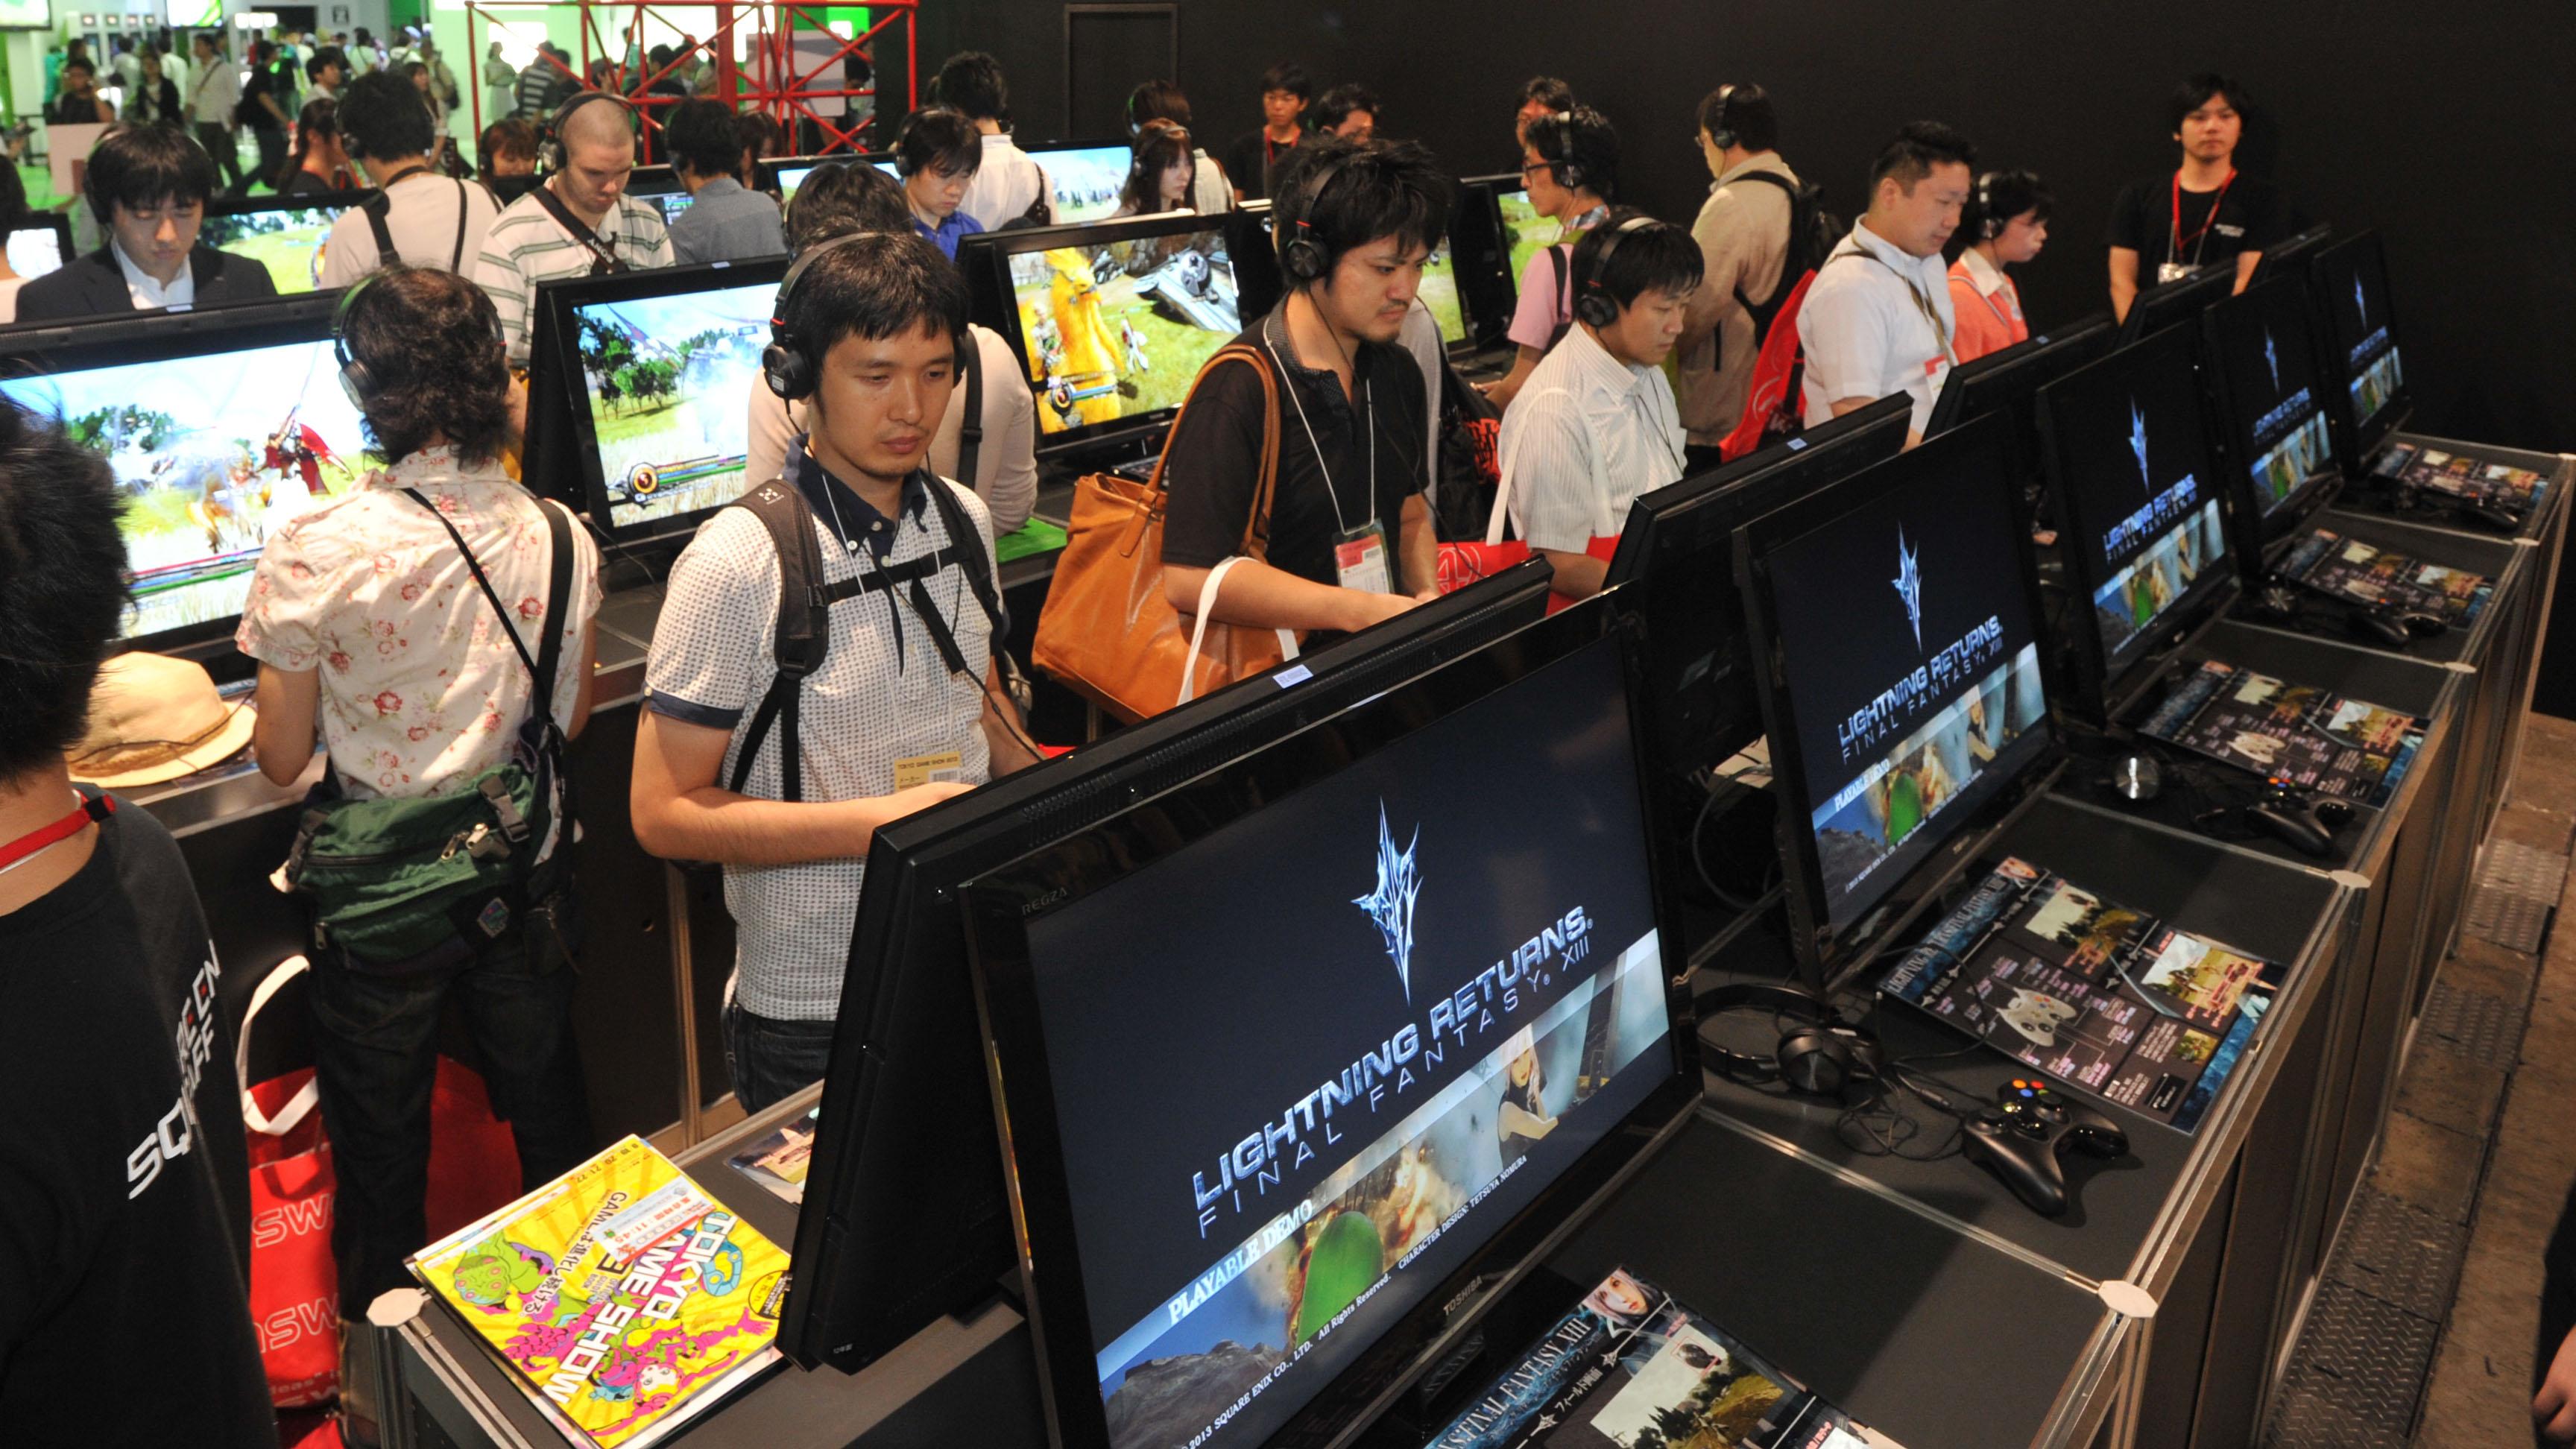 TOKYO GAME SHOW 2013., SQUARE ENIX, at Makuhari messe in Chiba prefect. on Sept. 19, 2013. YOSHIAKI MIURA PHOTO.